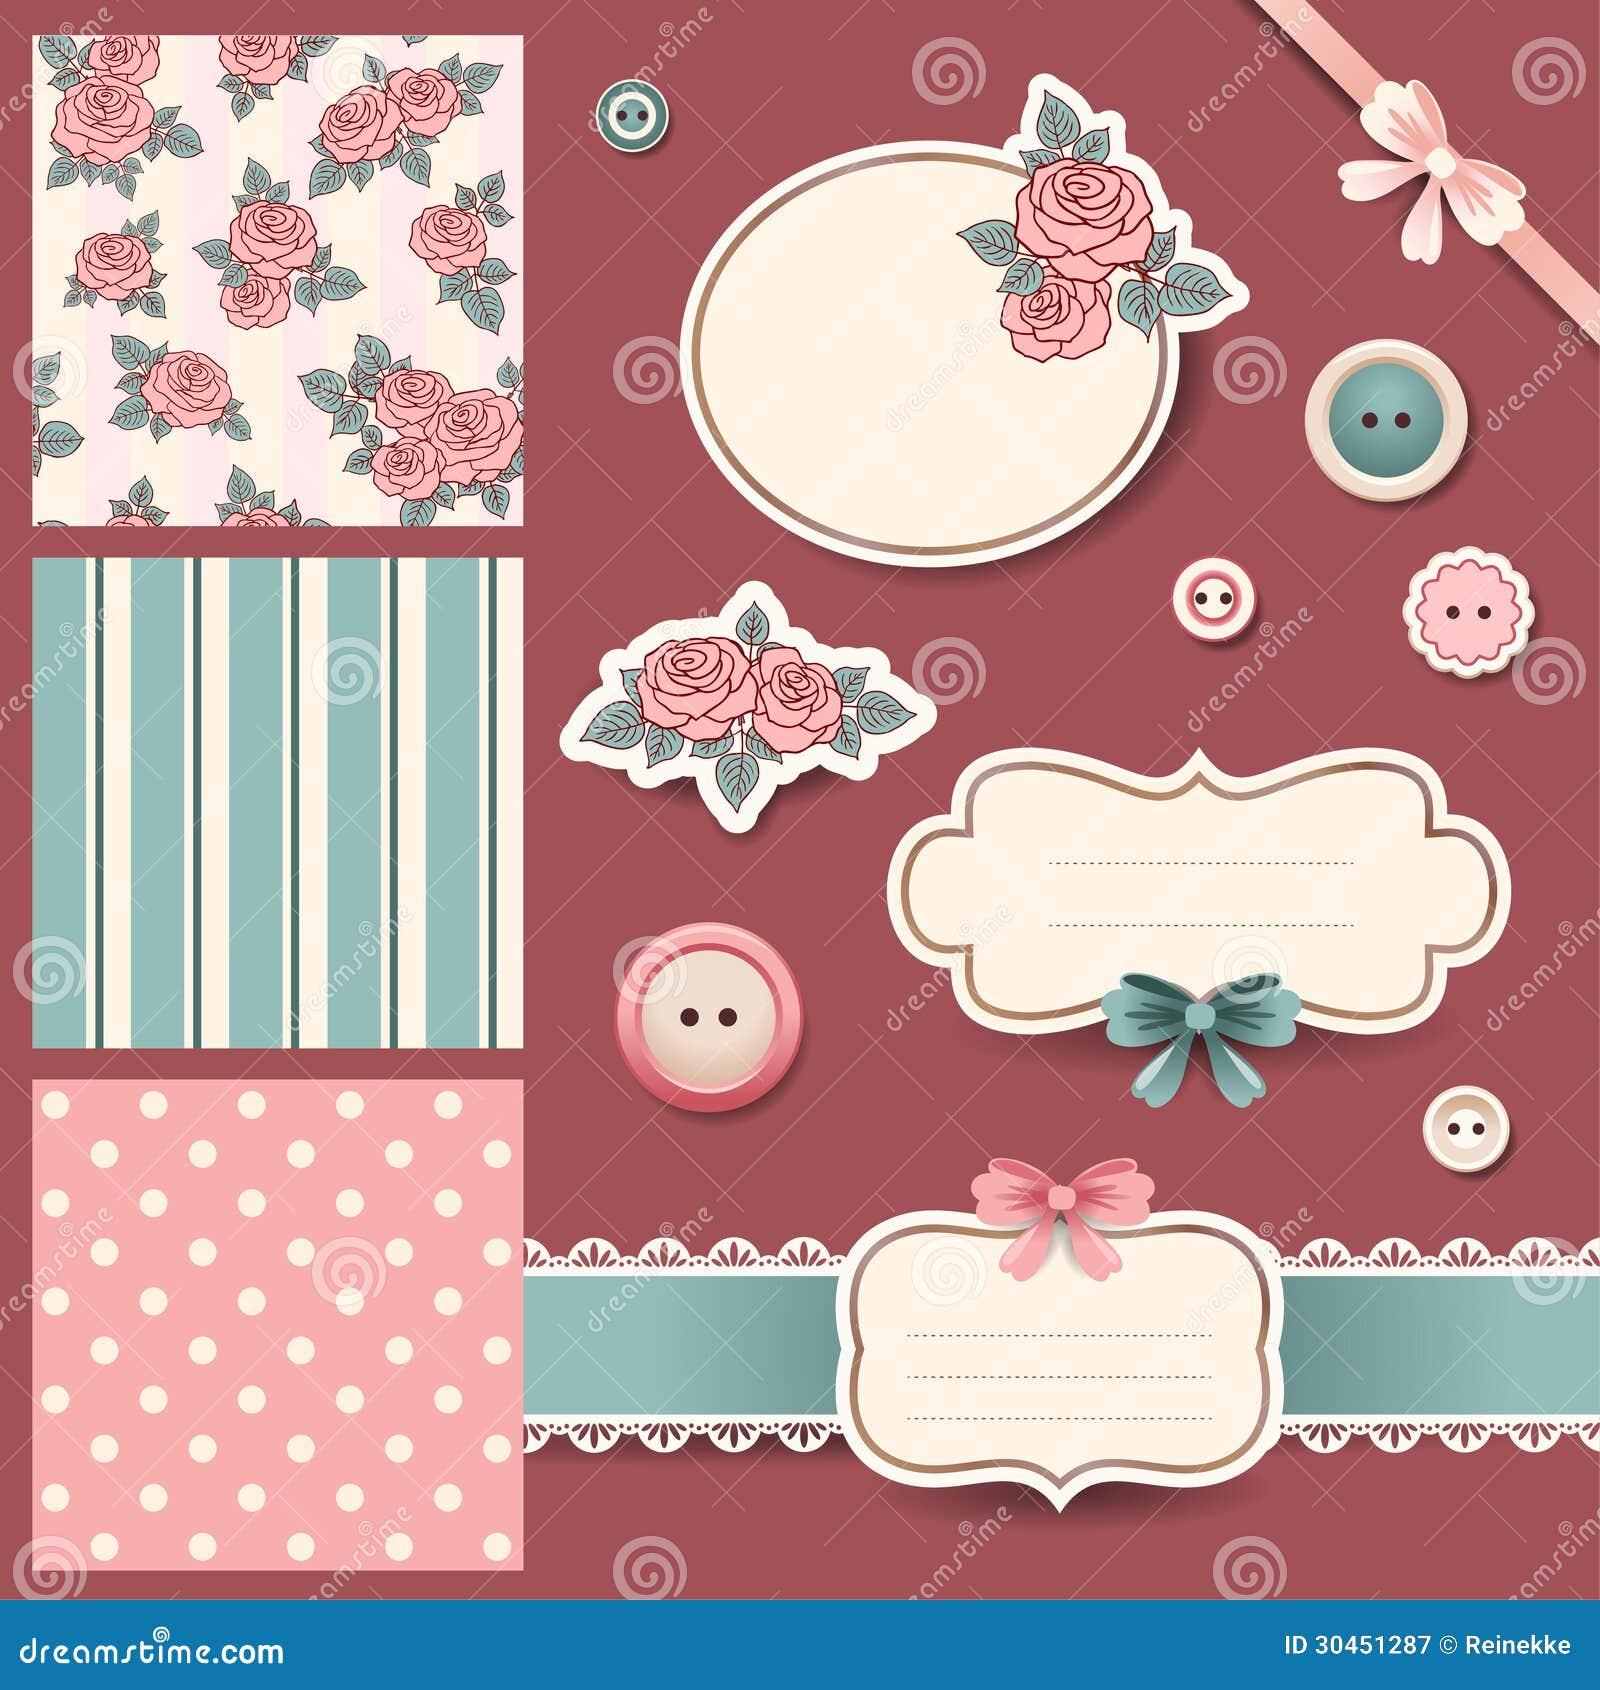 Scrapbook Design Elements Stock Vector Illustration Of Retro 30451287